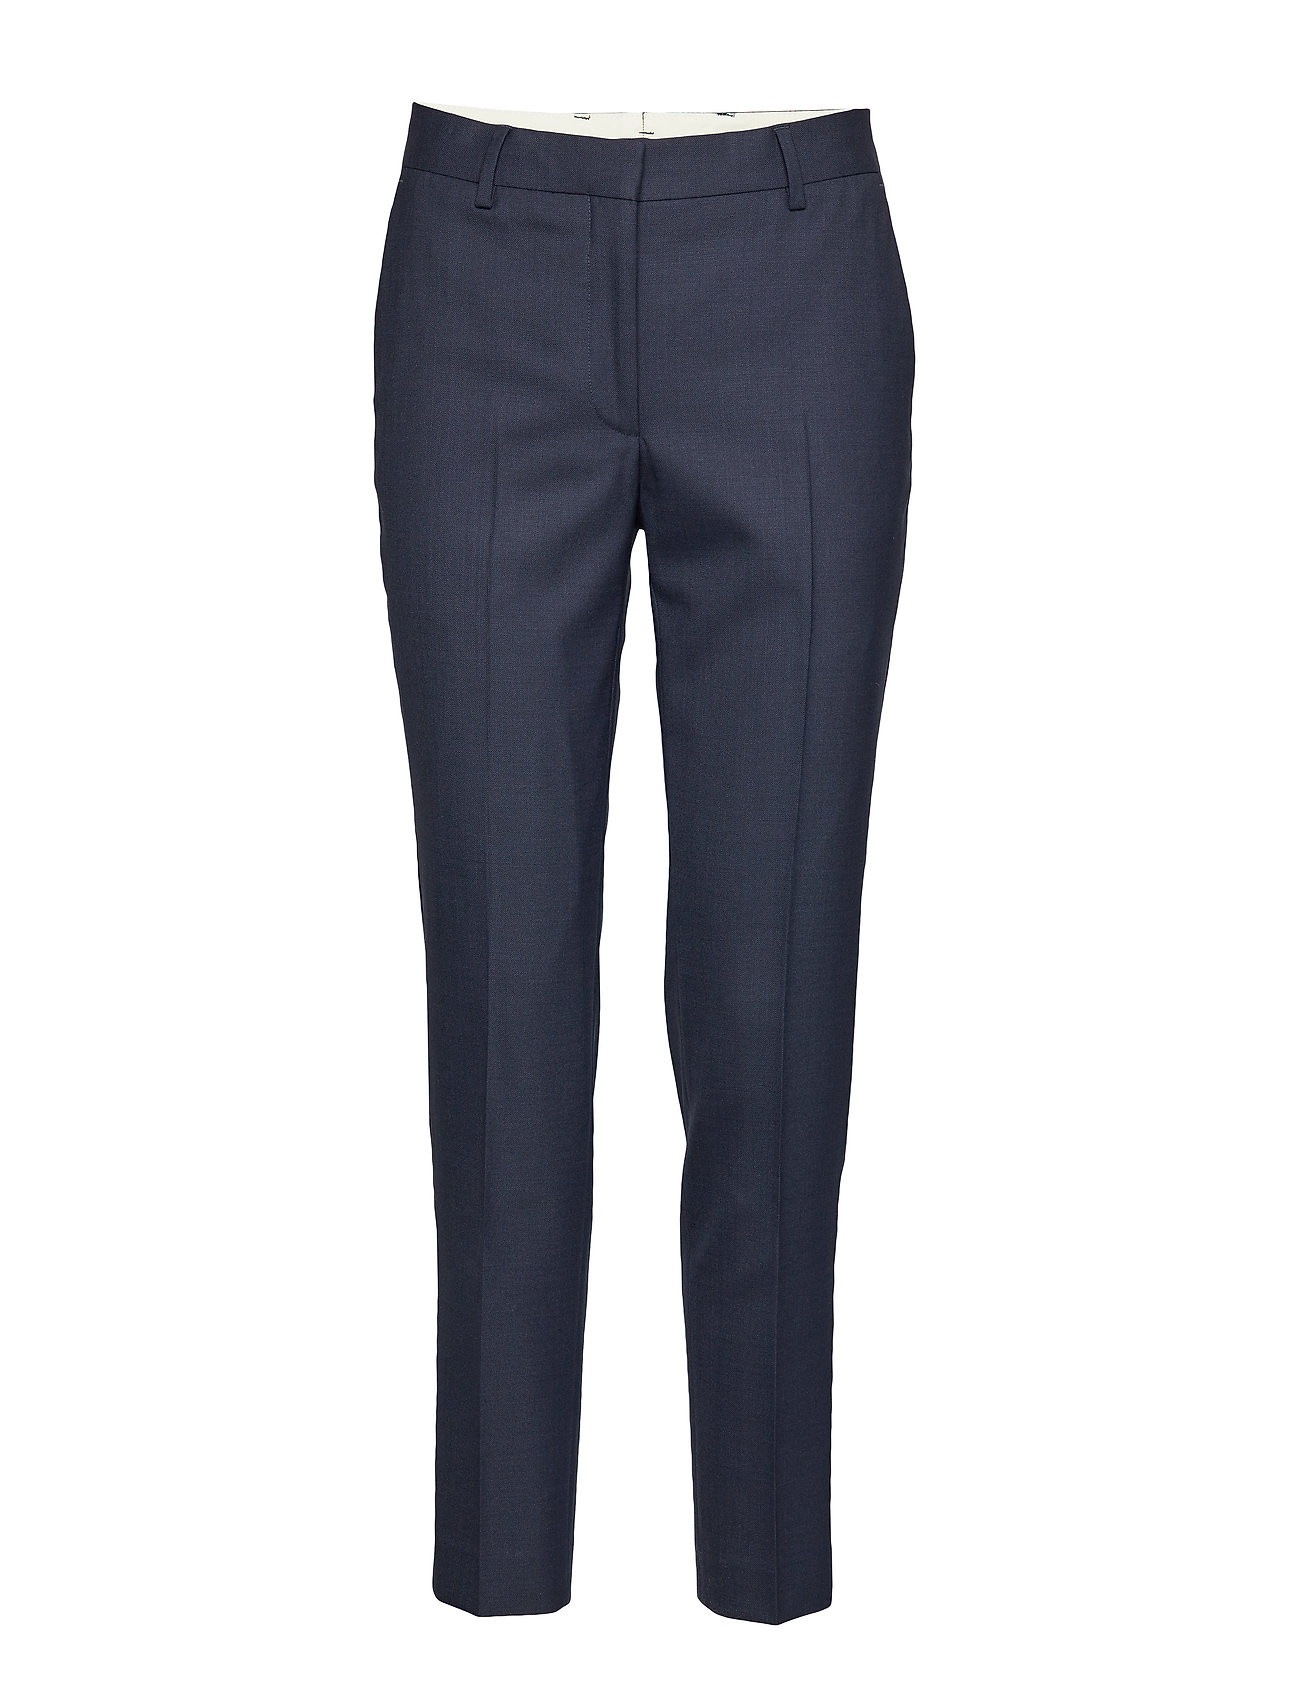 Image of Club Pants Bukser Med Lige Ben Blå Gant (3205357269)